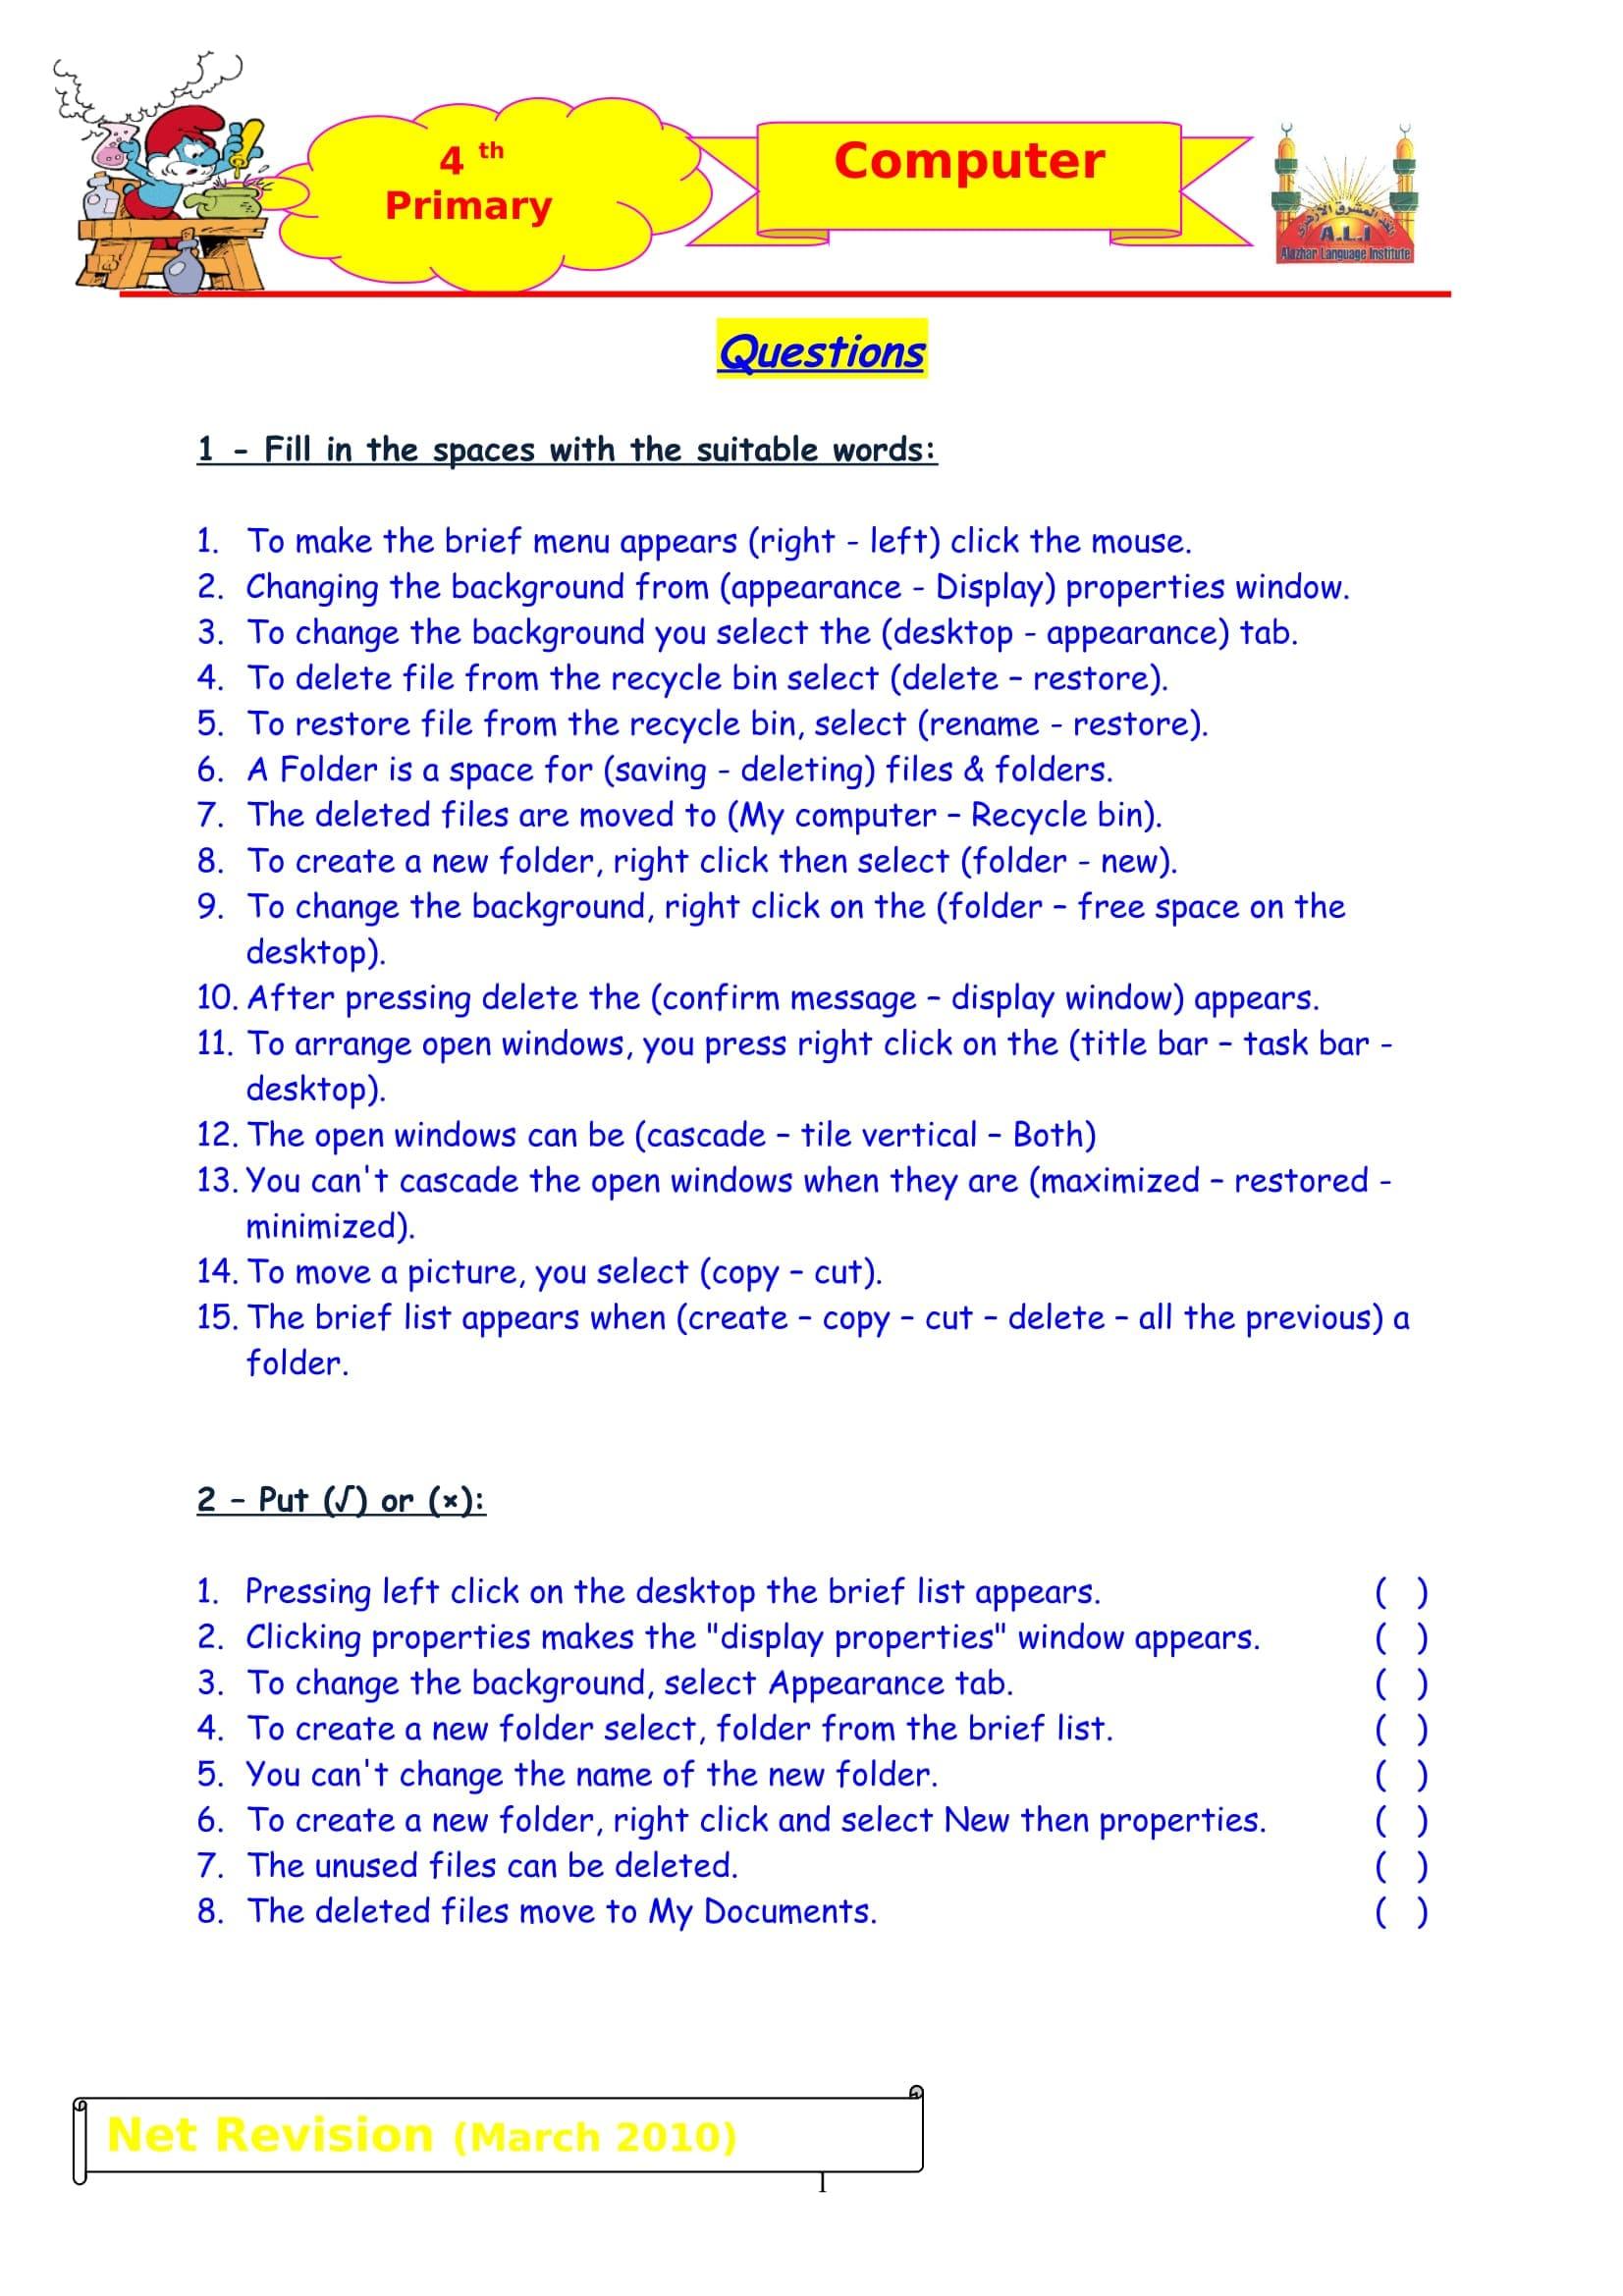 exam-eg.com_152362033132491.jpg